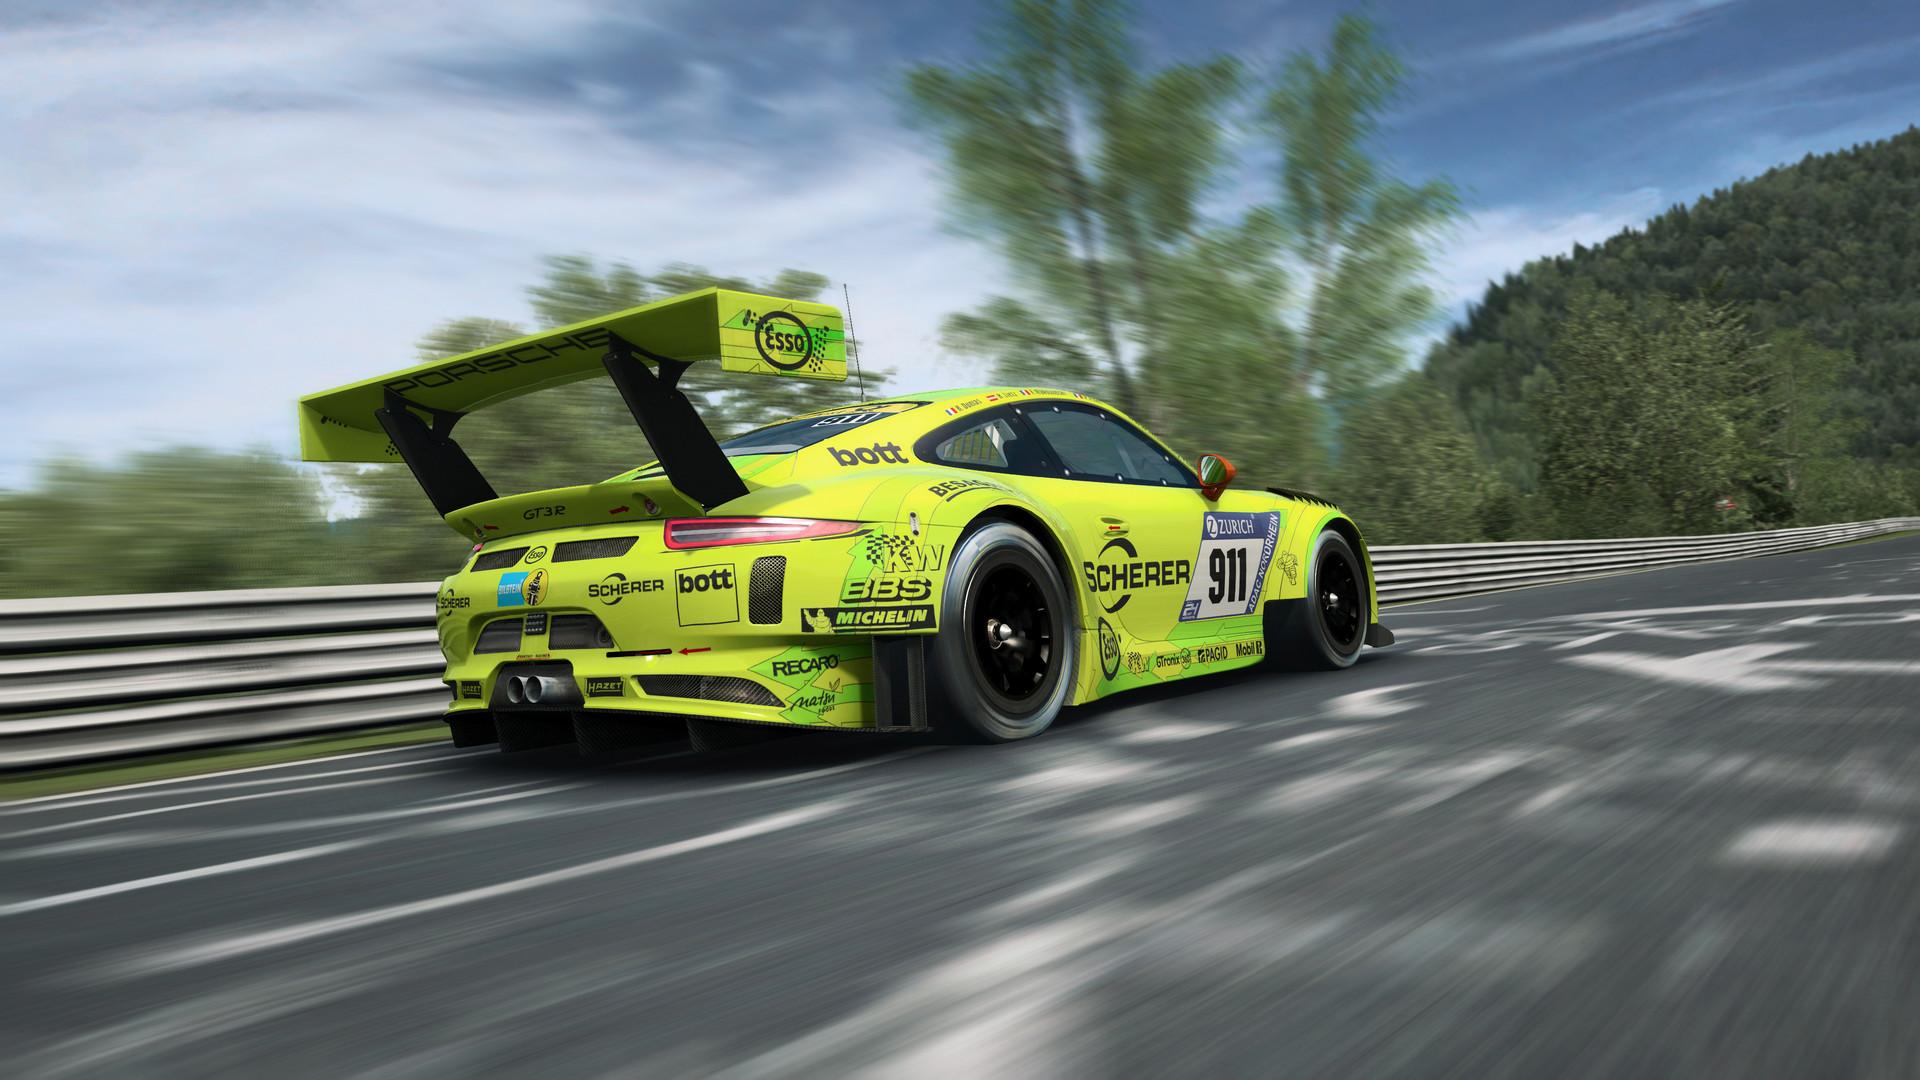 Vr Brille Für Raceroom : Raceroom racing experience on steam